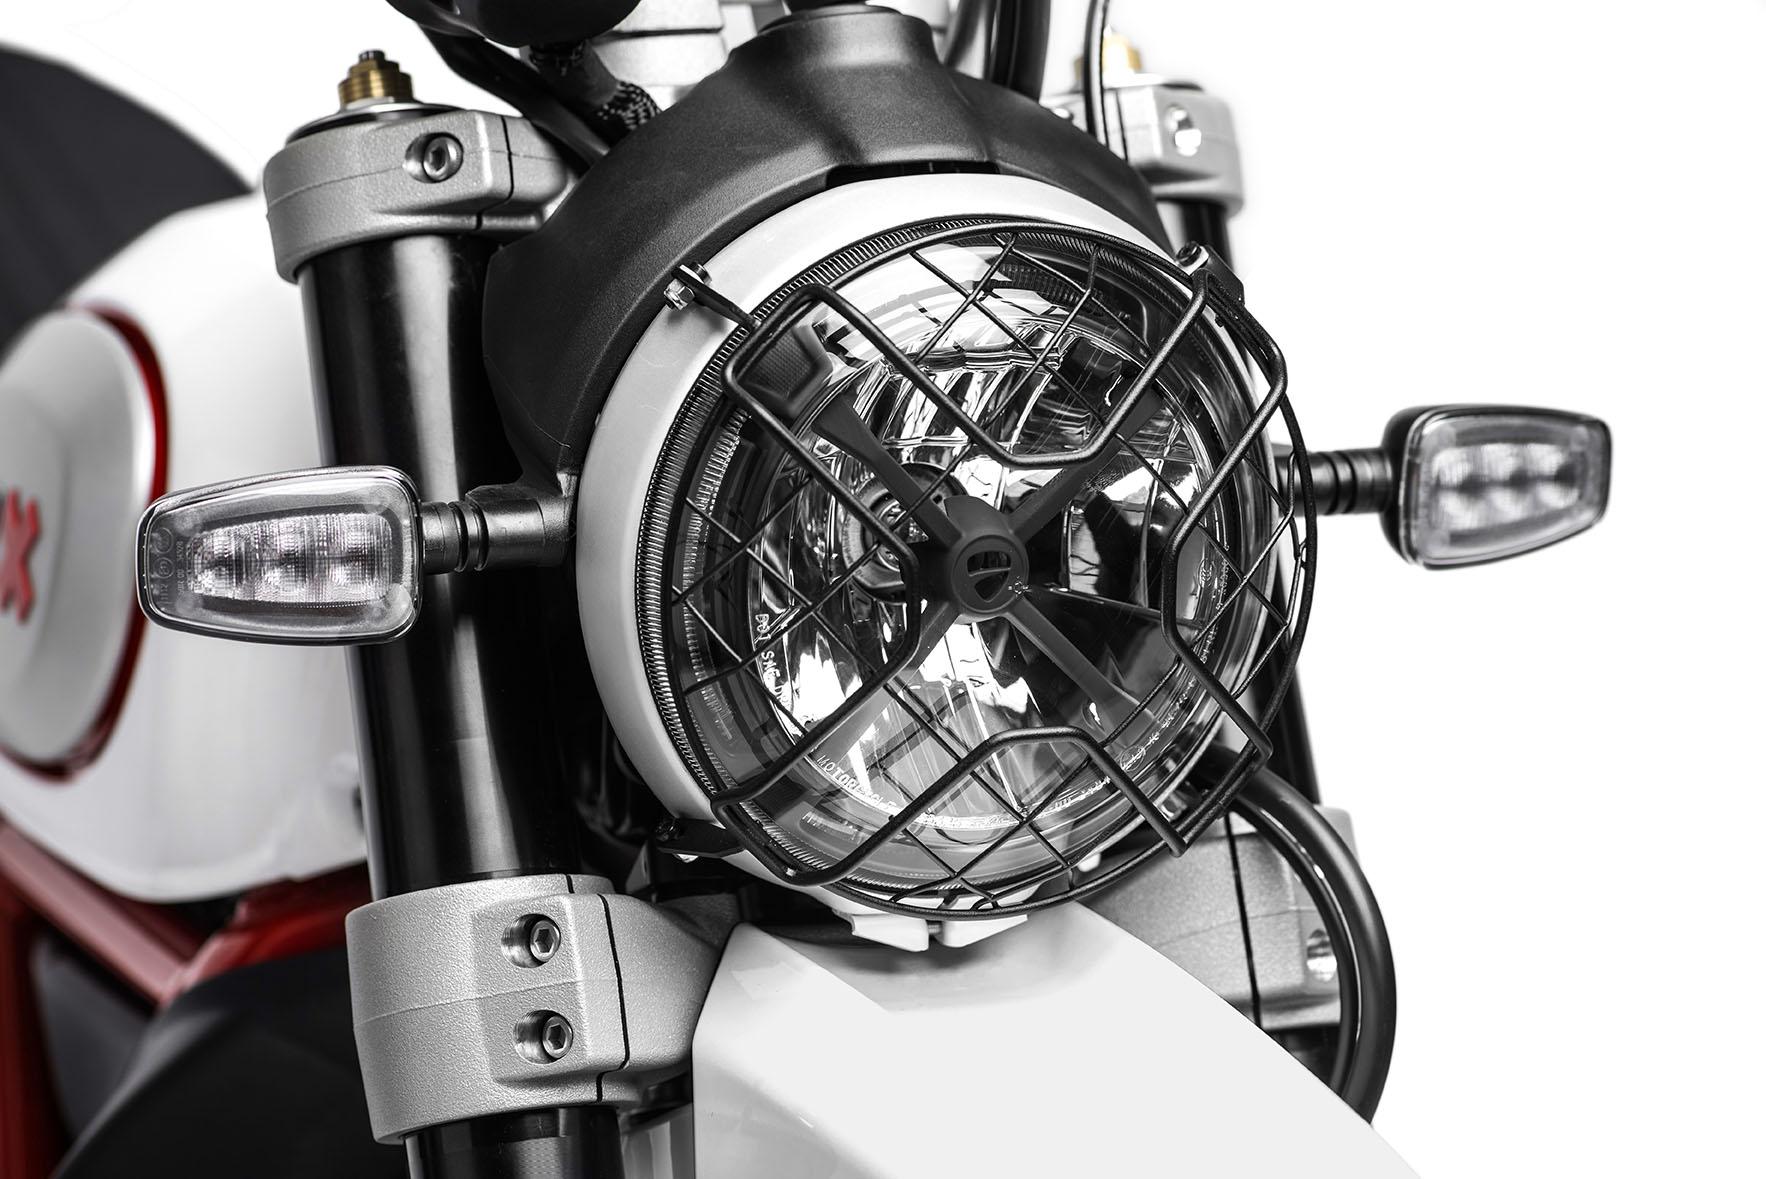 SCRAMBLER-DESERT-SLED-Ducati-Montreal-5